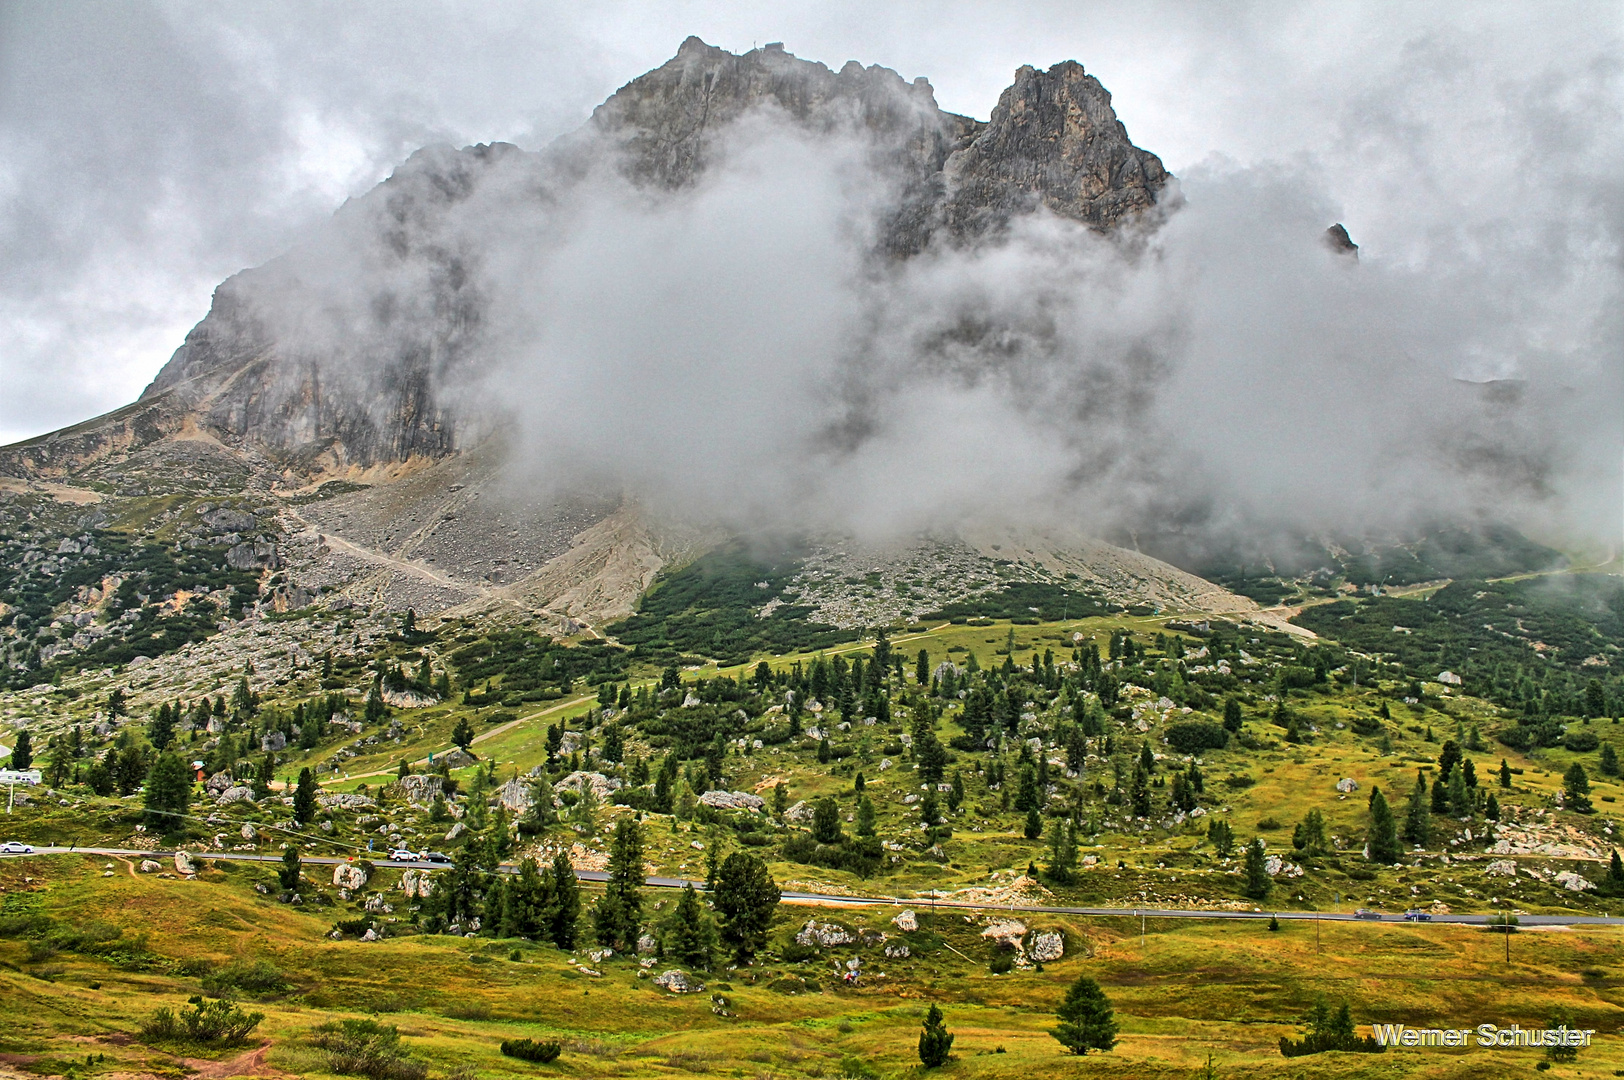 Der Langazuoi (2778m) am Falzarego Pass